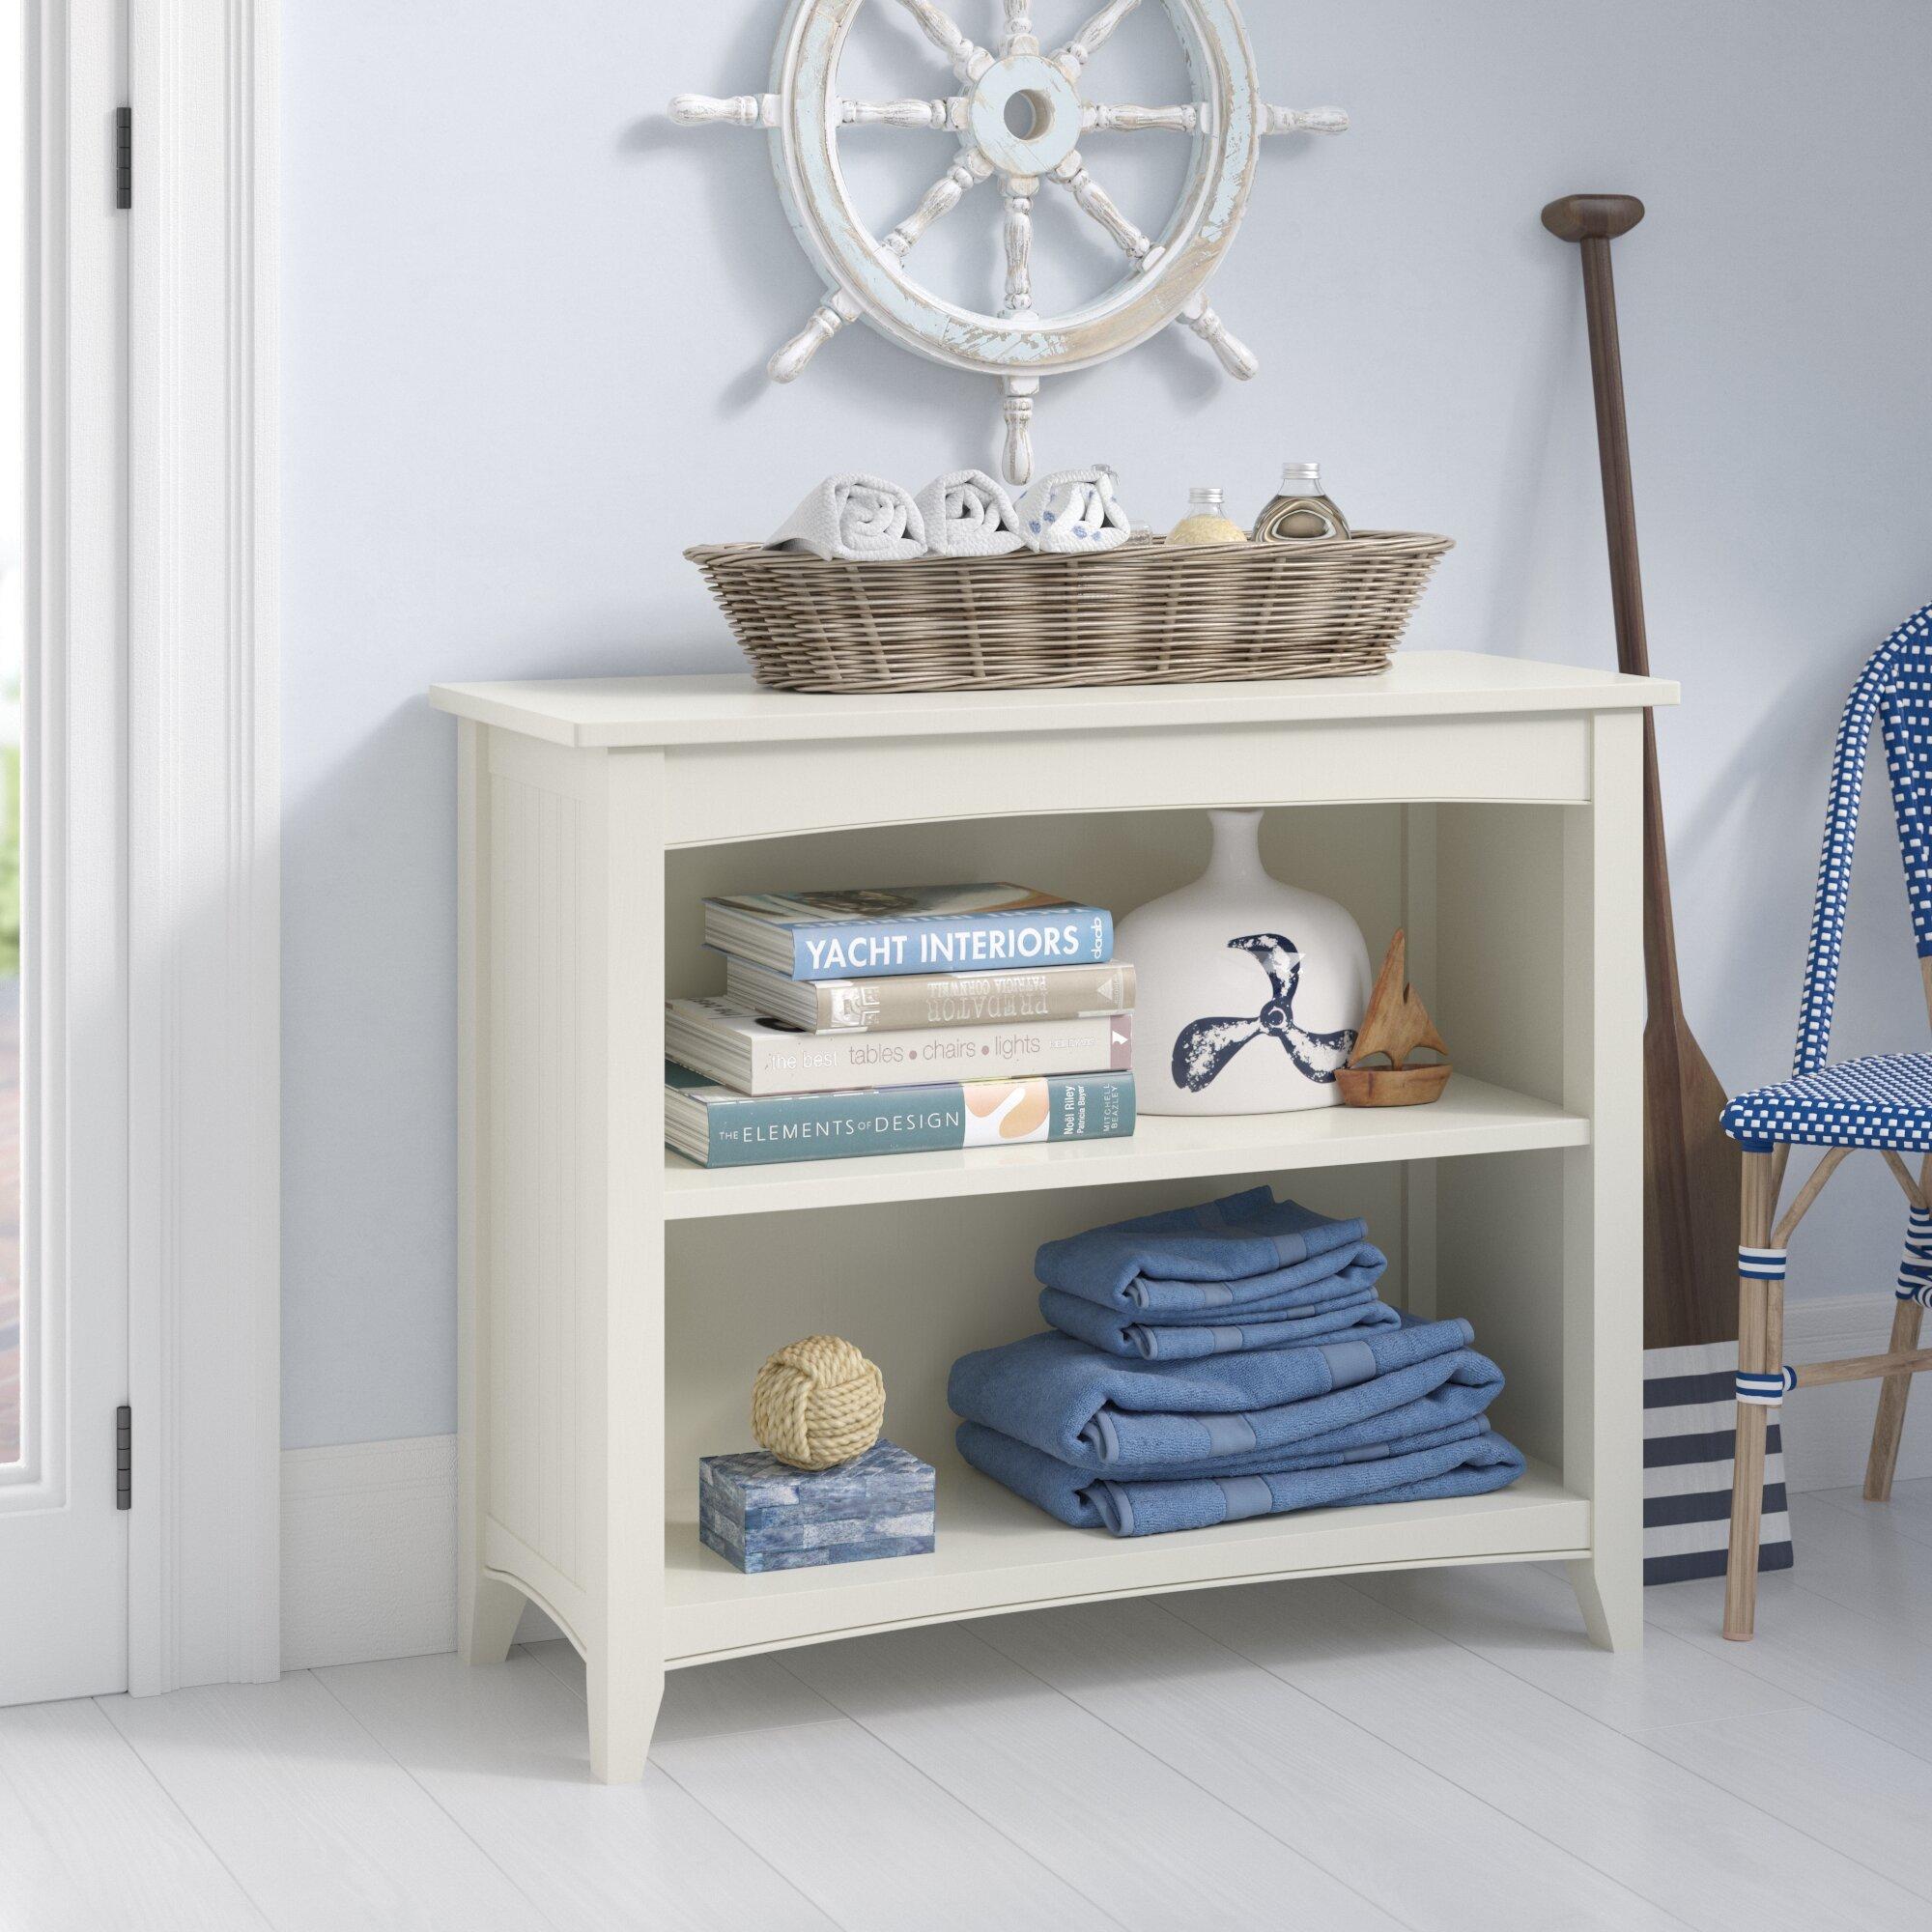 Creative 10x Baby Kid Pet Safety Safe Lock Fridge Toilet Drawer Cabinet Cupboard Door Perfect In Workmanship Interior